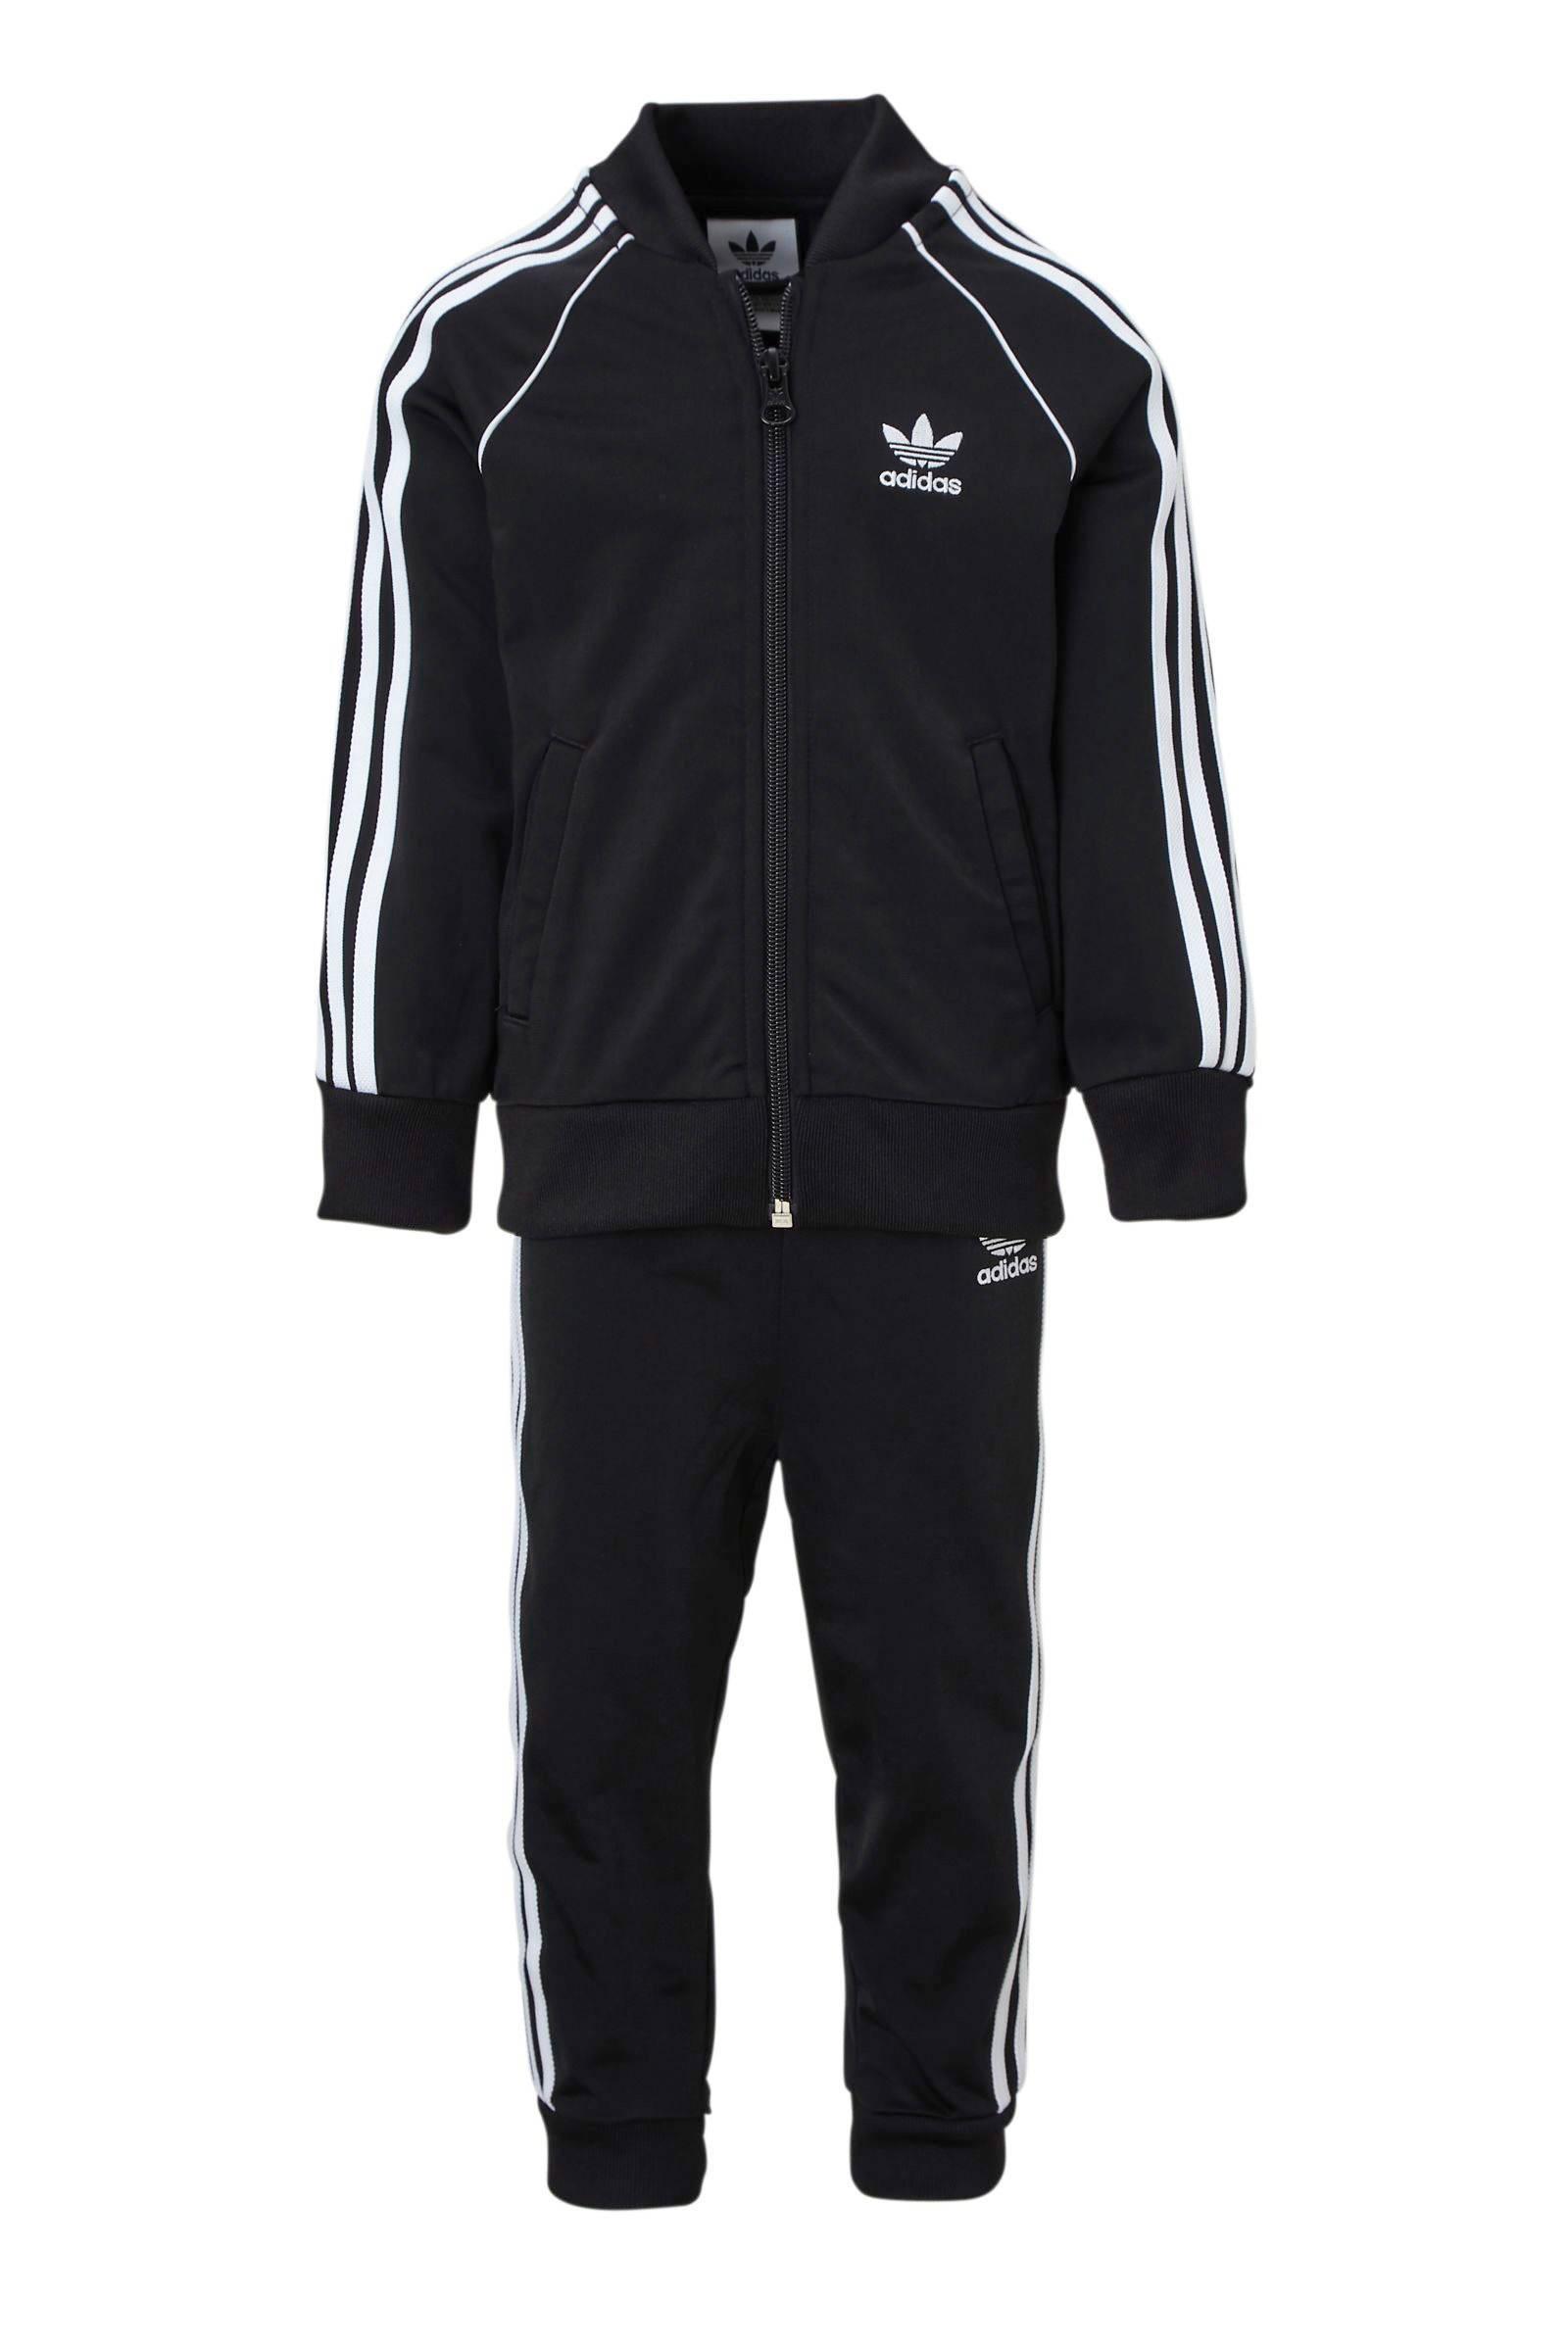 adidas Originals trainingspak zwart | wehkamp